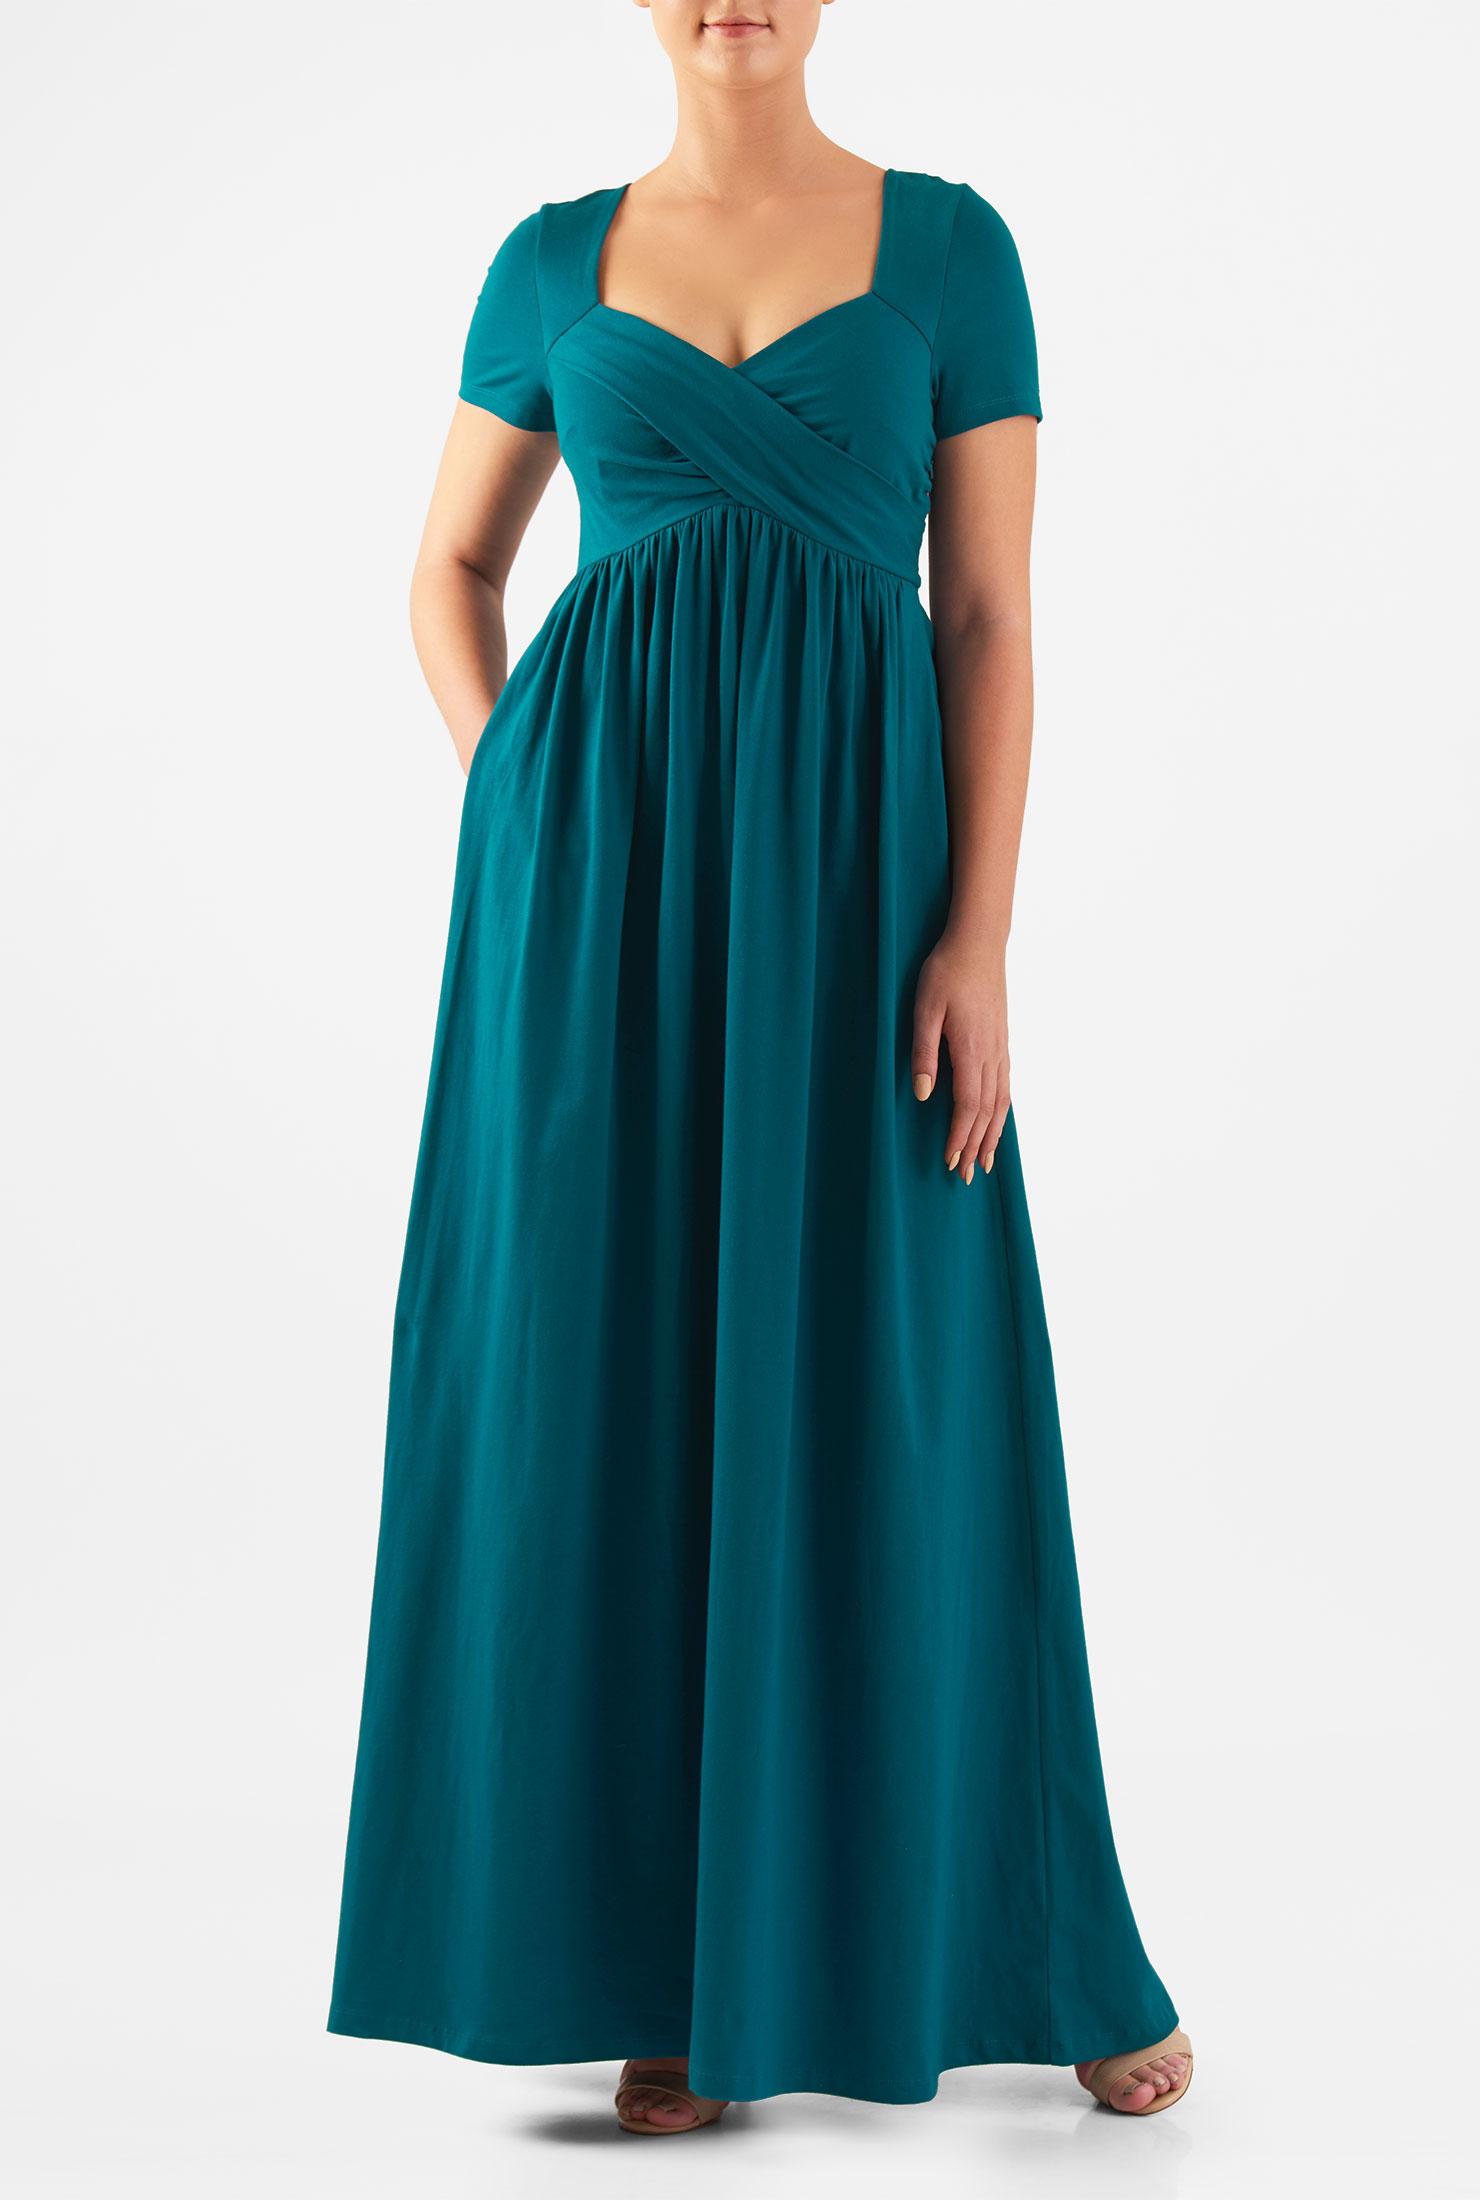 Eshakti Womens Cross Front Empire Cotton Knit Maxi Dress